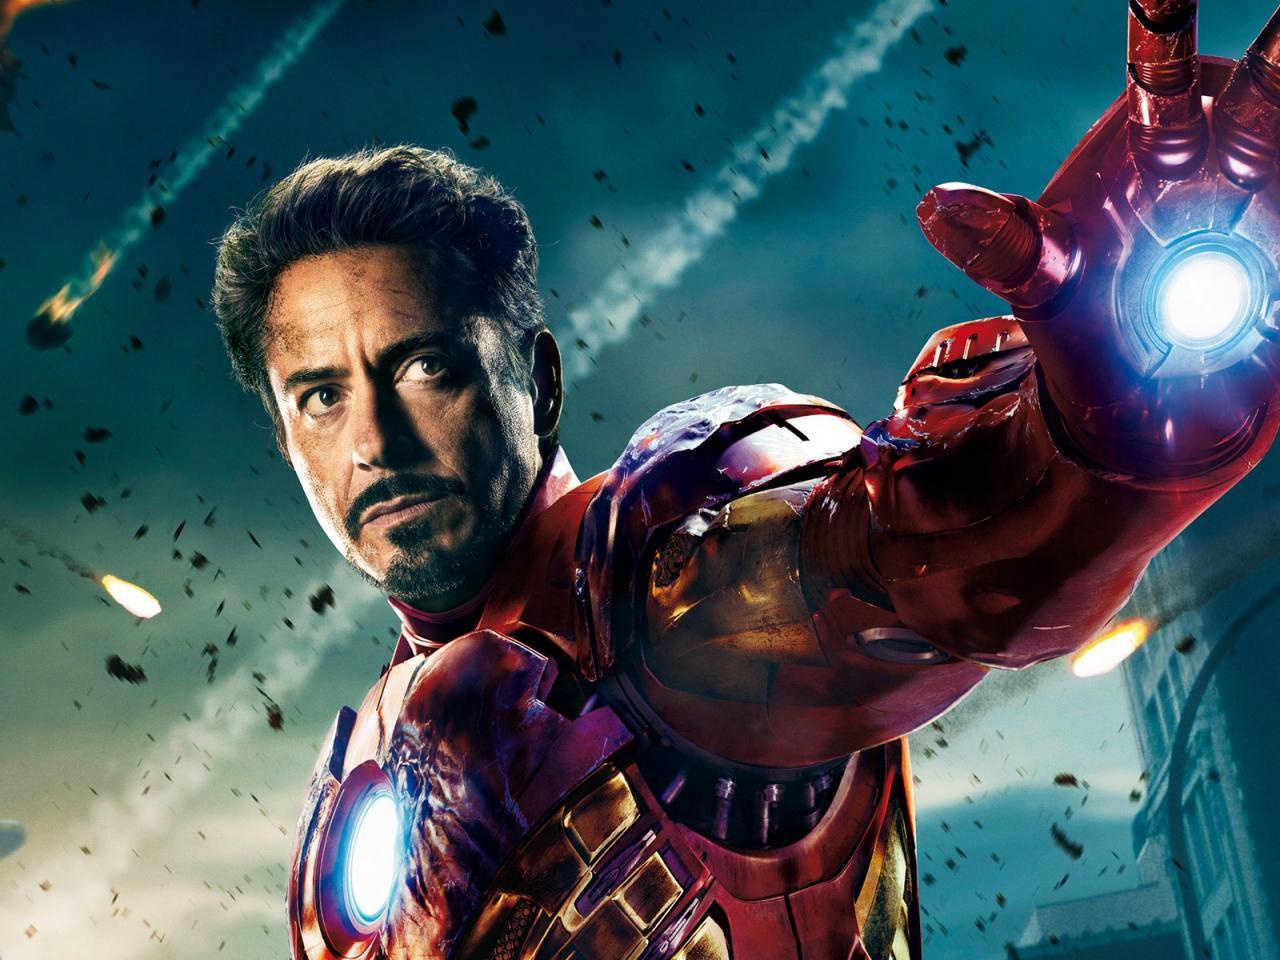 https://cinemaplanet.pt/wp-content/uploads/2016/04/Robert-Downey-Jr-Iron-Man.jpg